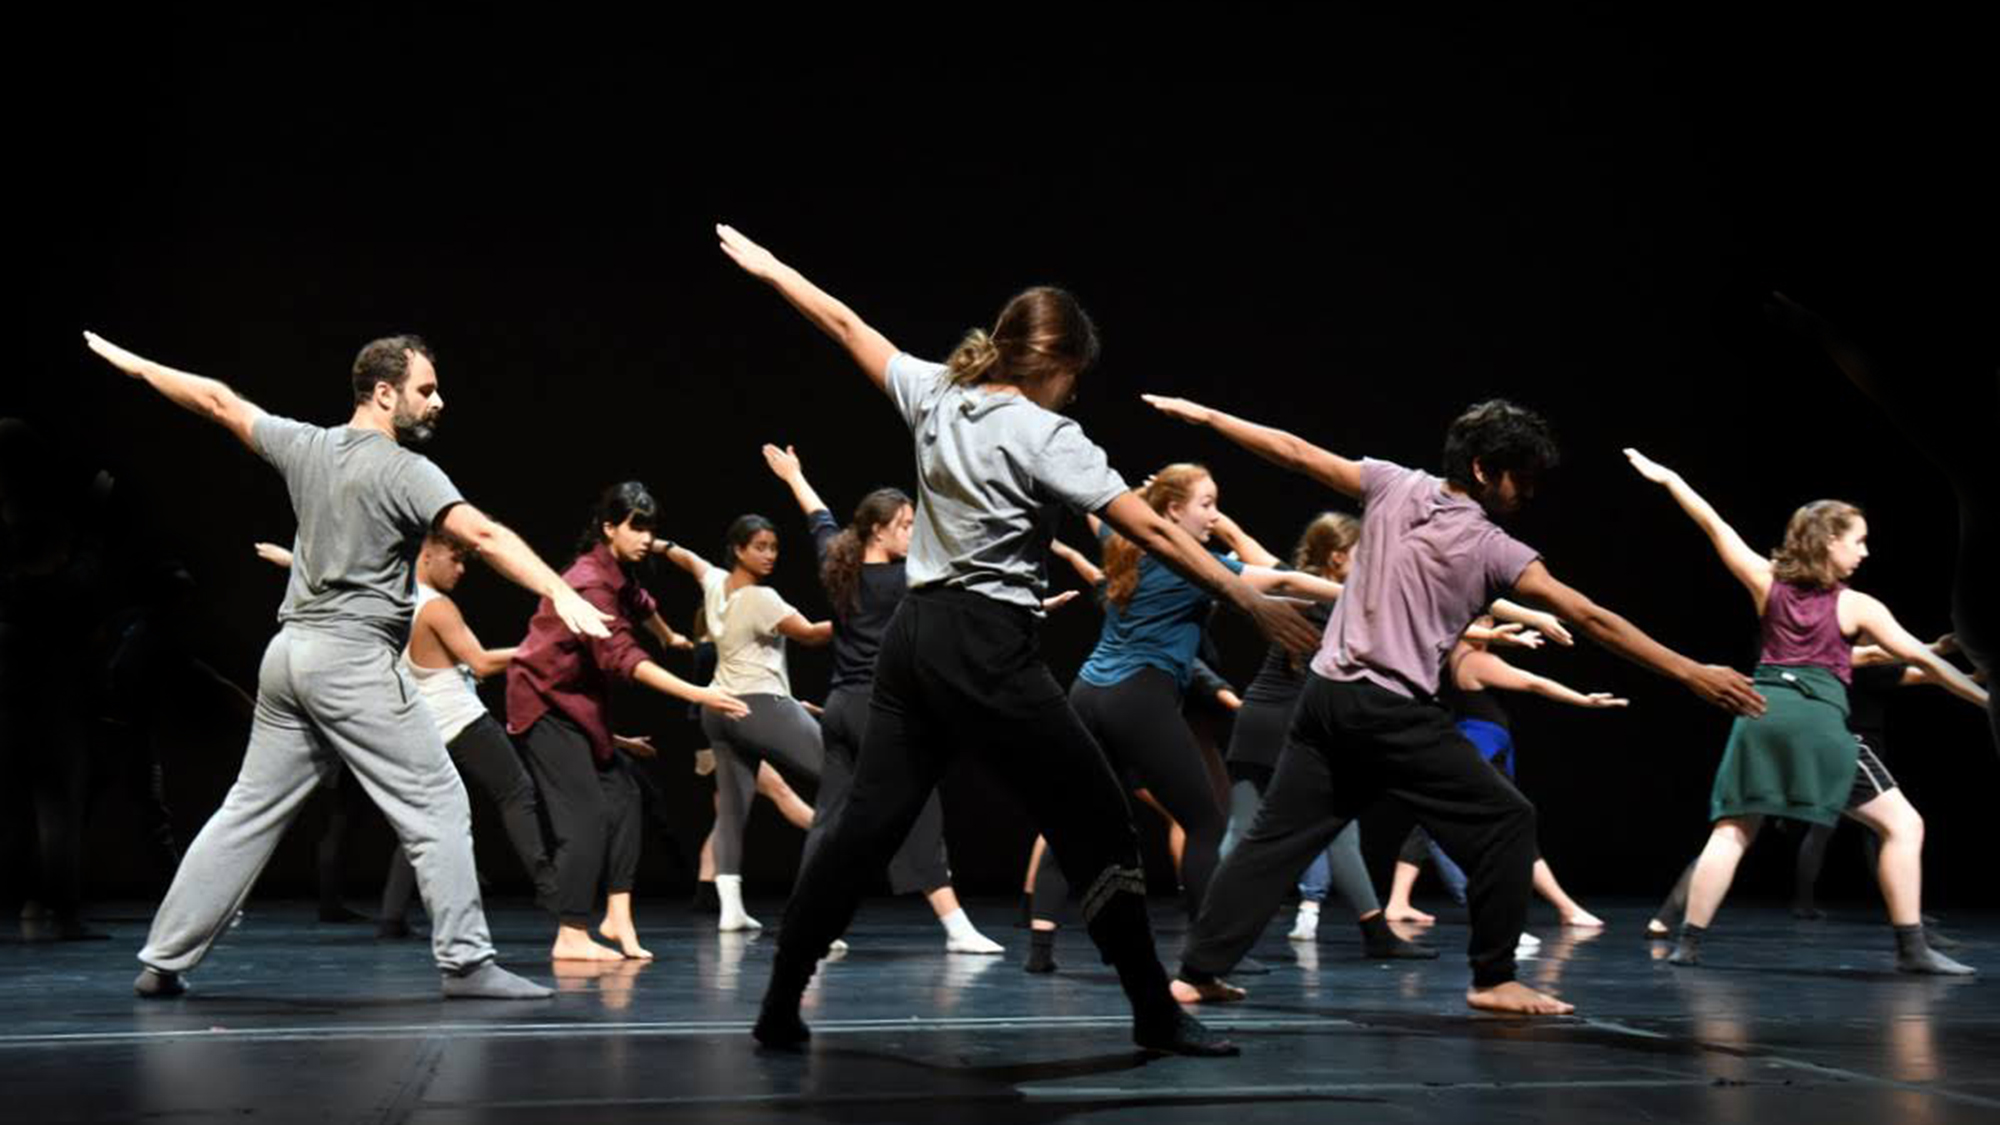 Atelier de danse Hervé Koubi